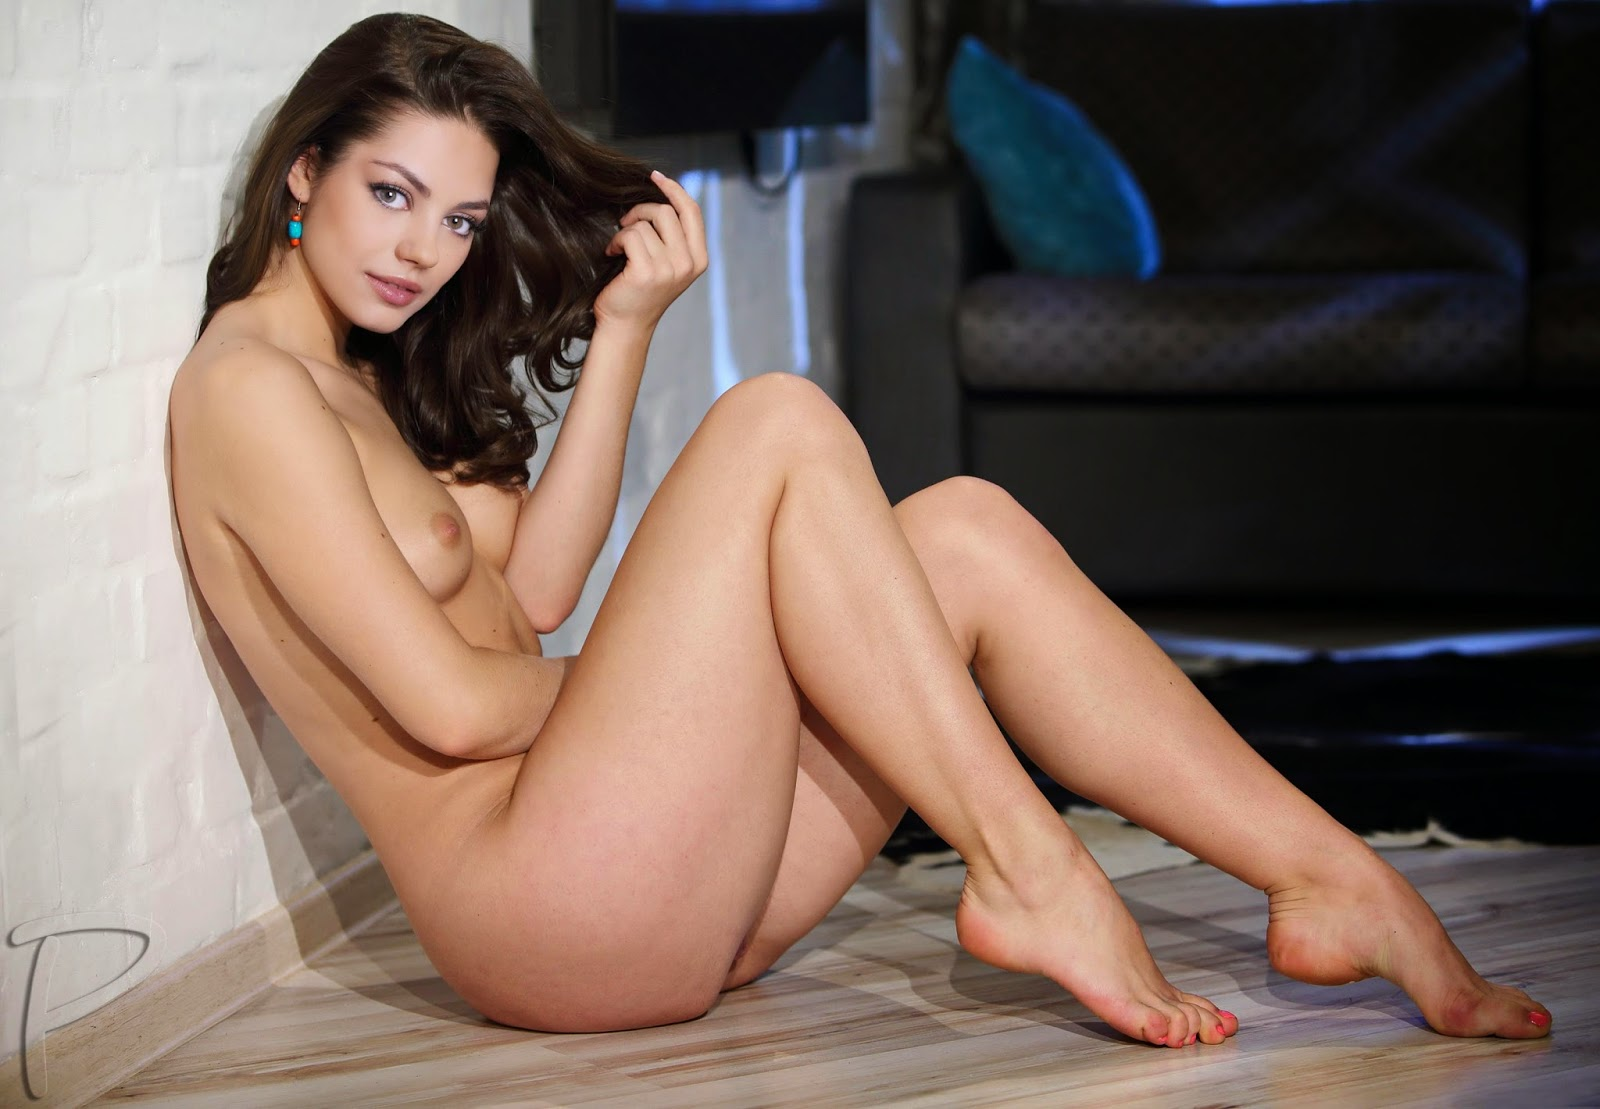 Mila Kunis Nude and Hot Posing